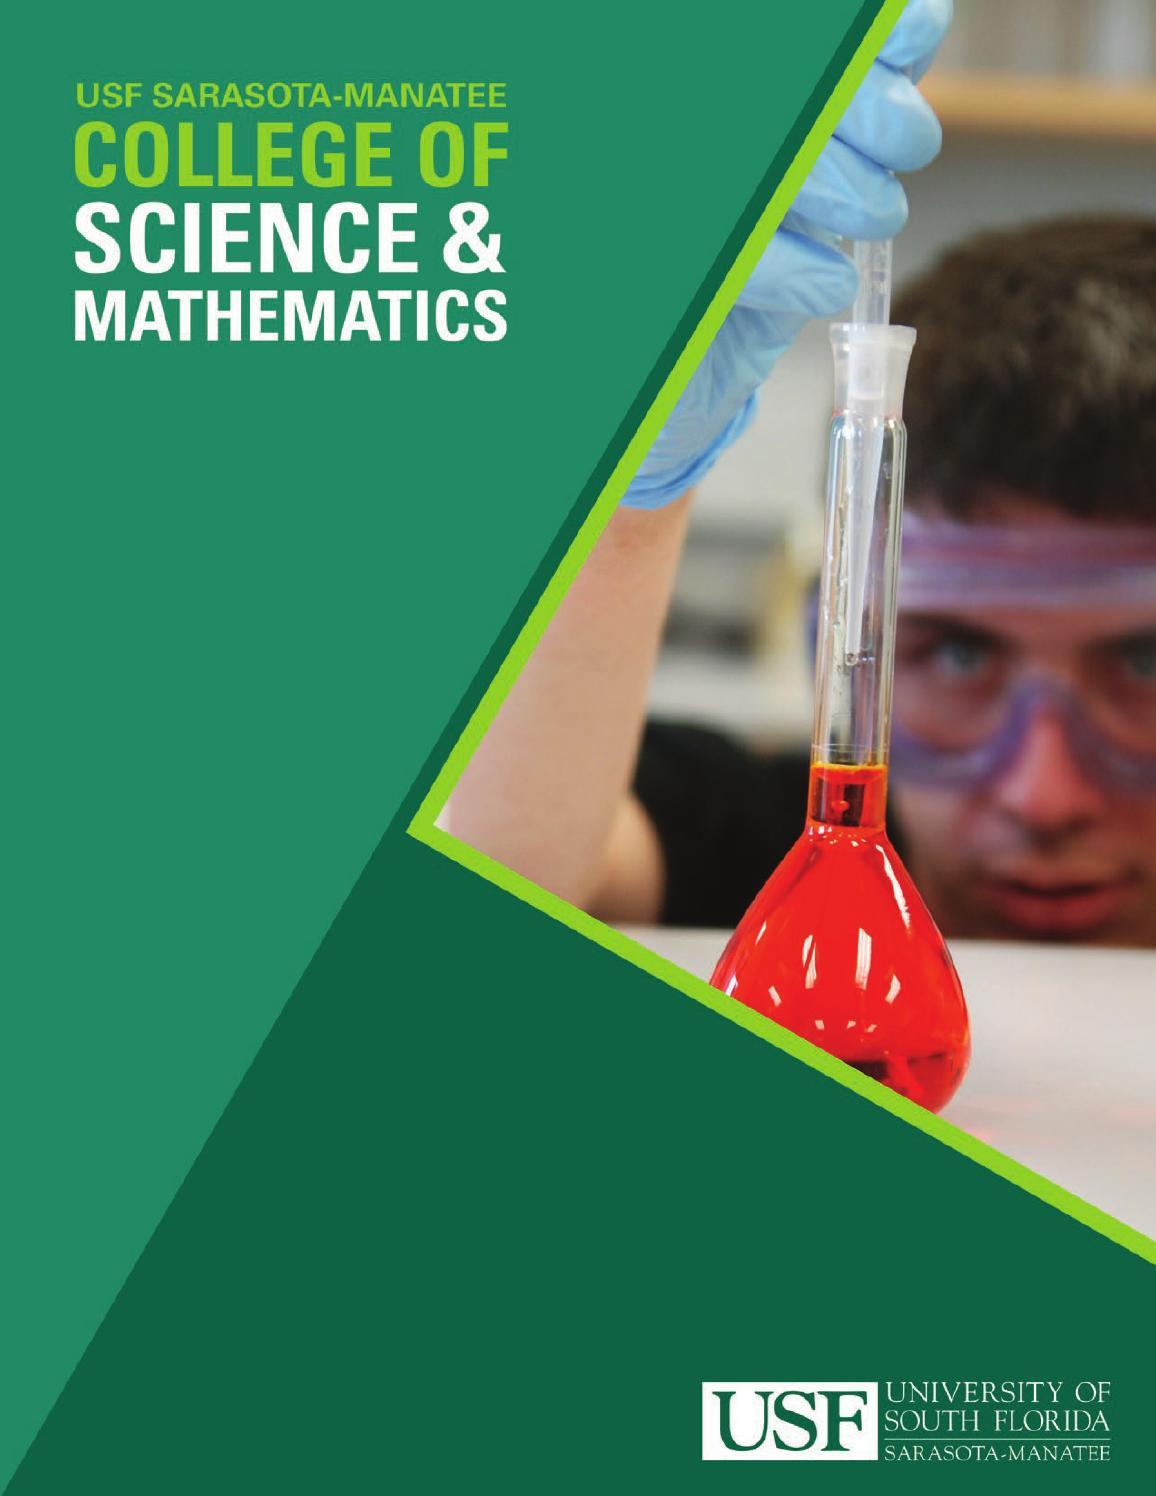 USF Sarasota-Manatee College of Science & Mathematics